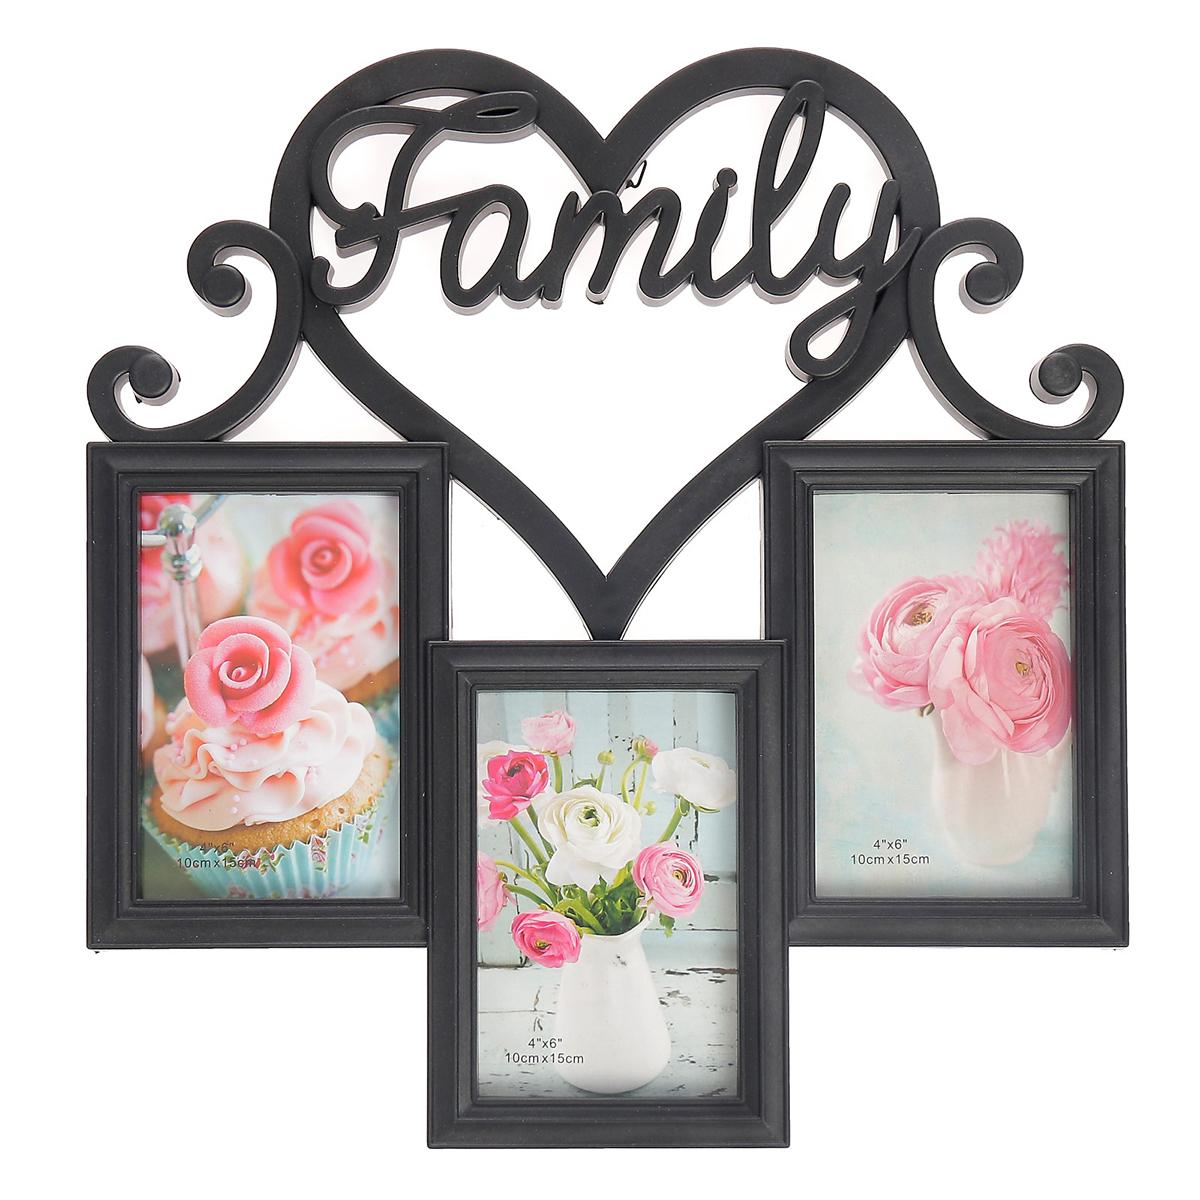 Фоторамка Сердце семьи, на 3 фото, 10 х 15 см, цвет: черный. 2789257 фоторамки русские подарки фоторамка